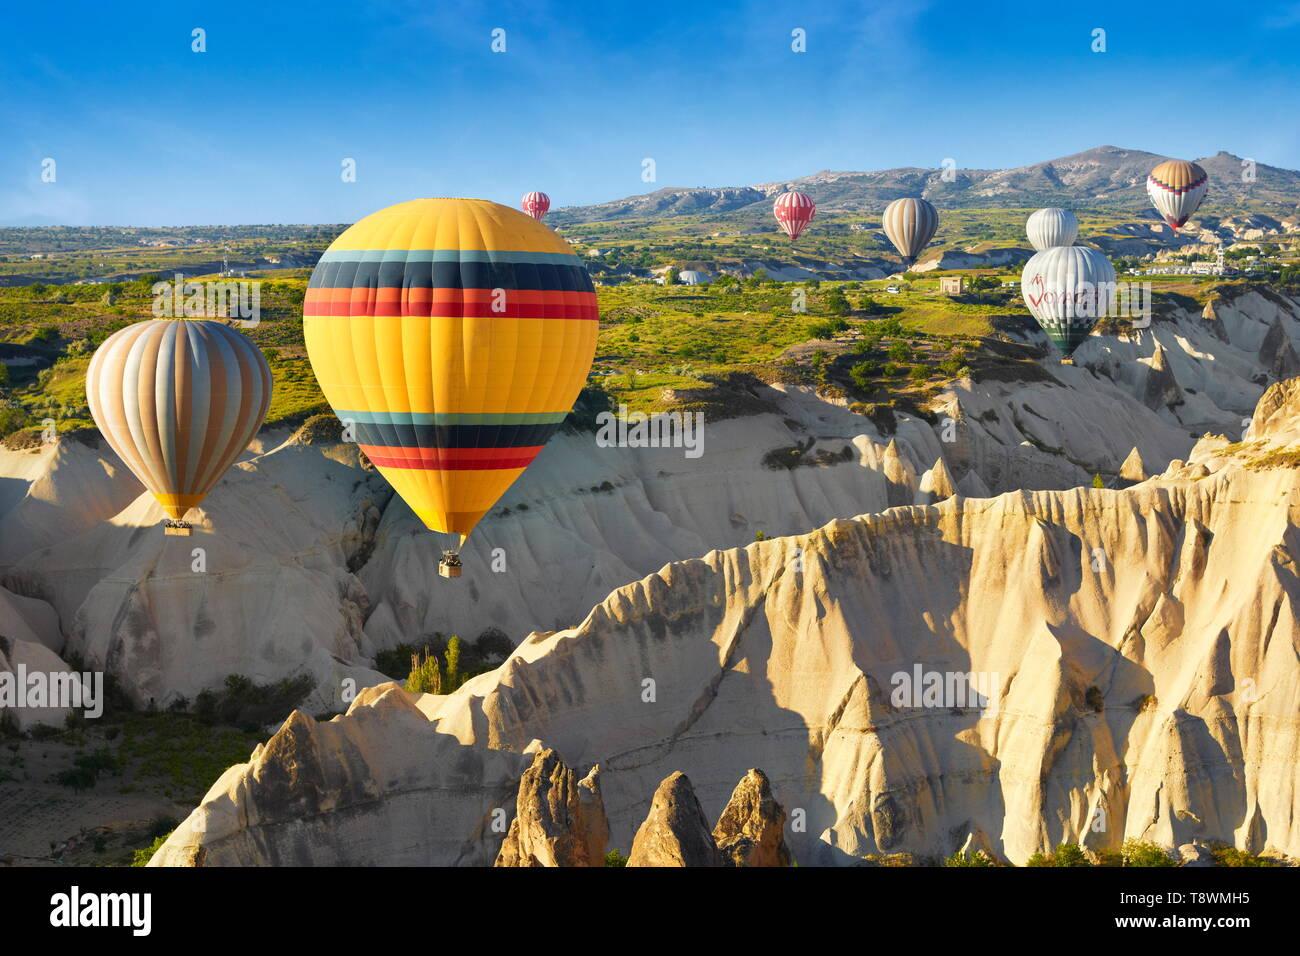 Cappadocia - Turkey, view from the balloon around Nevsehir, flying over Cappadocia in Hot-air balloon, UNESCO - Stock Image